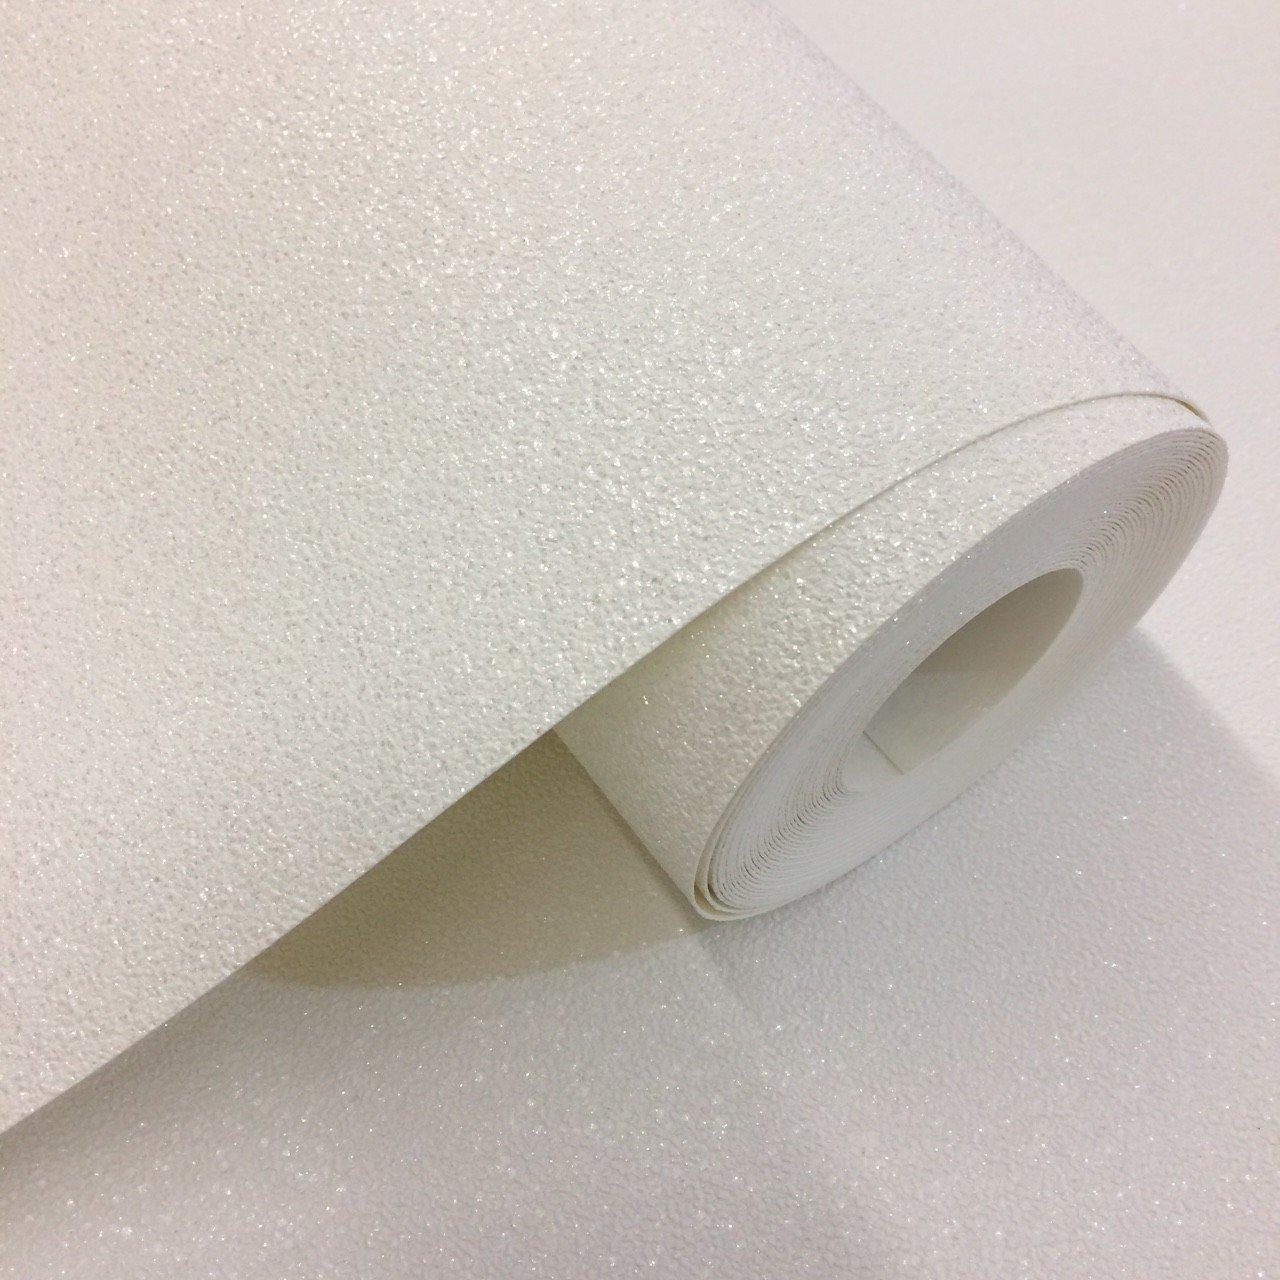 White Glitter - Wallpaper Border - 10 Metres Long x 17.6cm Wide wallpapers2u